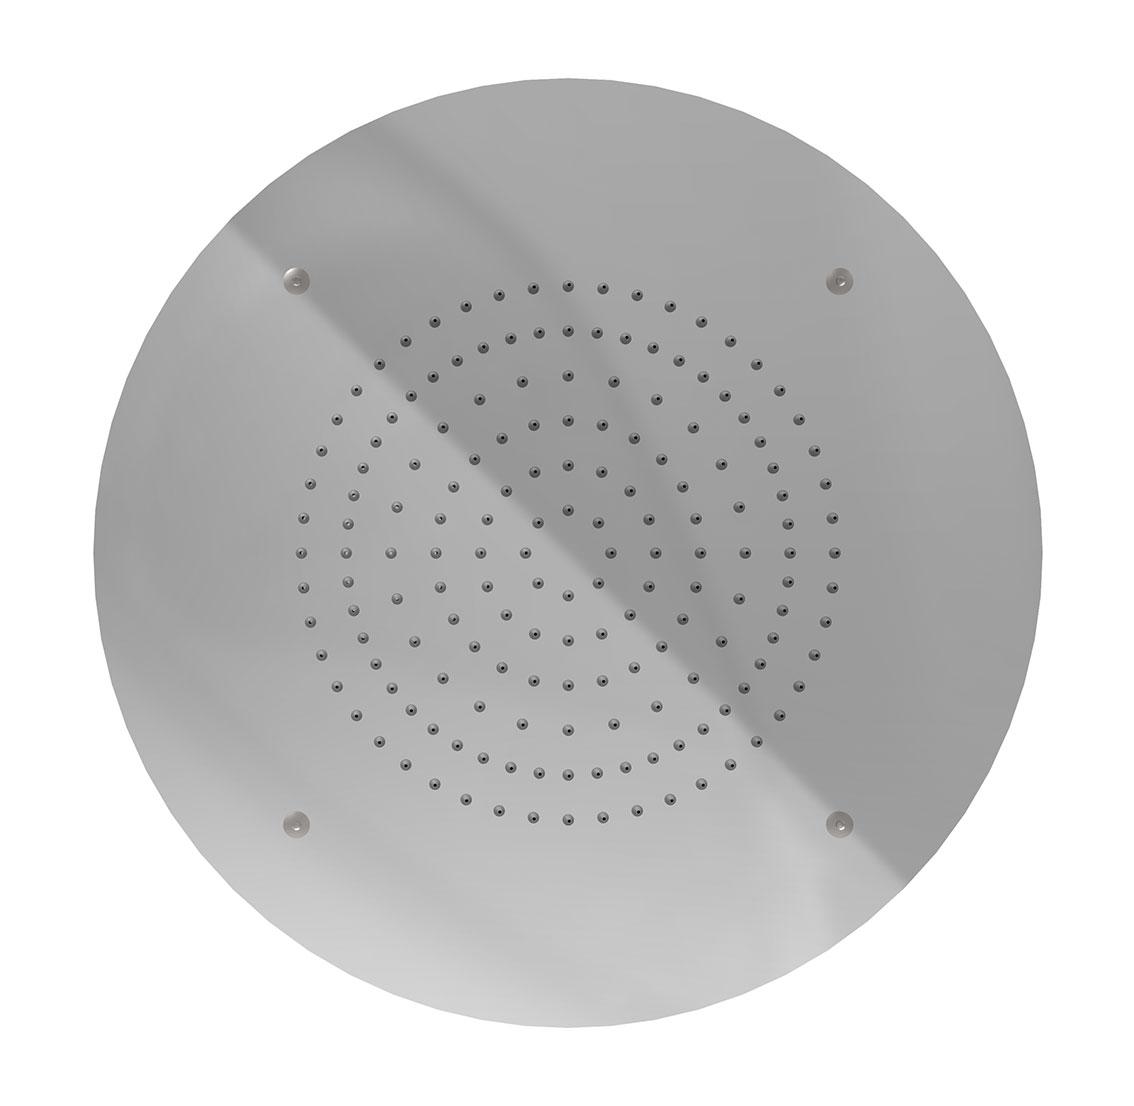 soffione-doccia-acciaio-inox-kings-ad-incasso-diam-400-mm-3.jpg